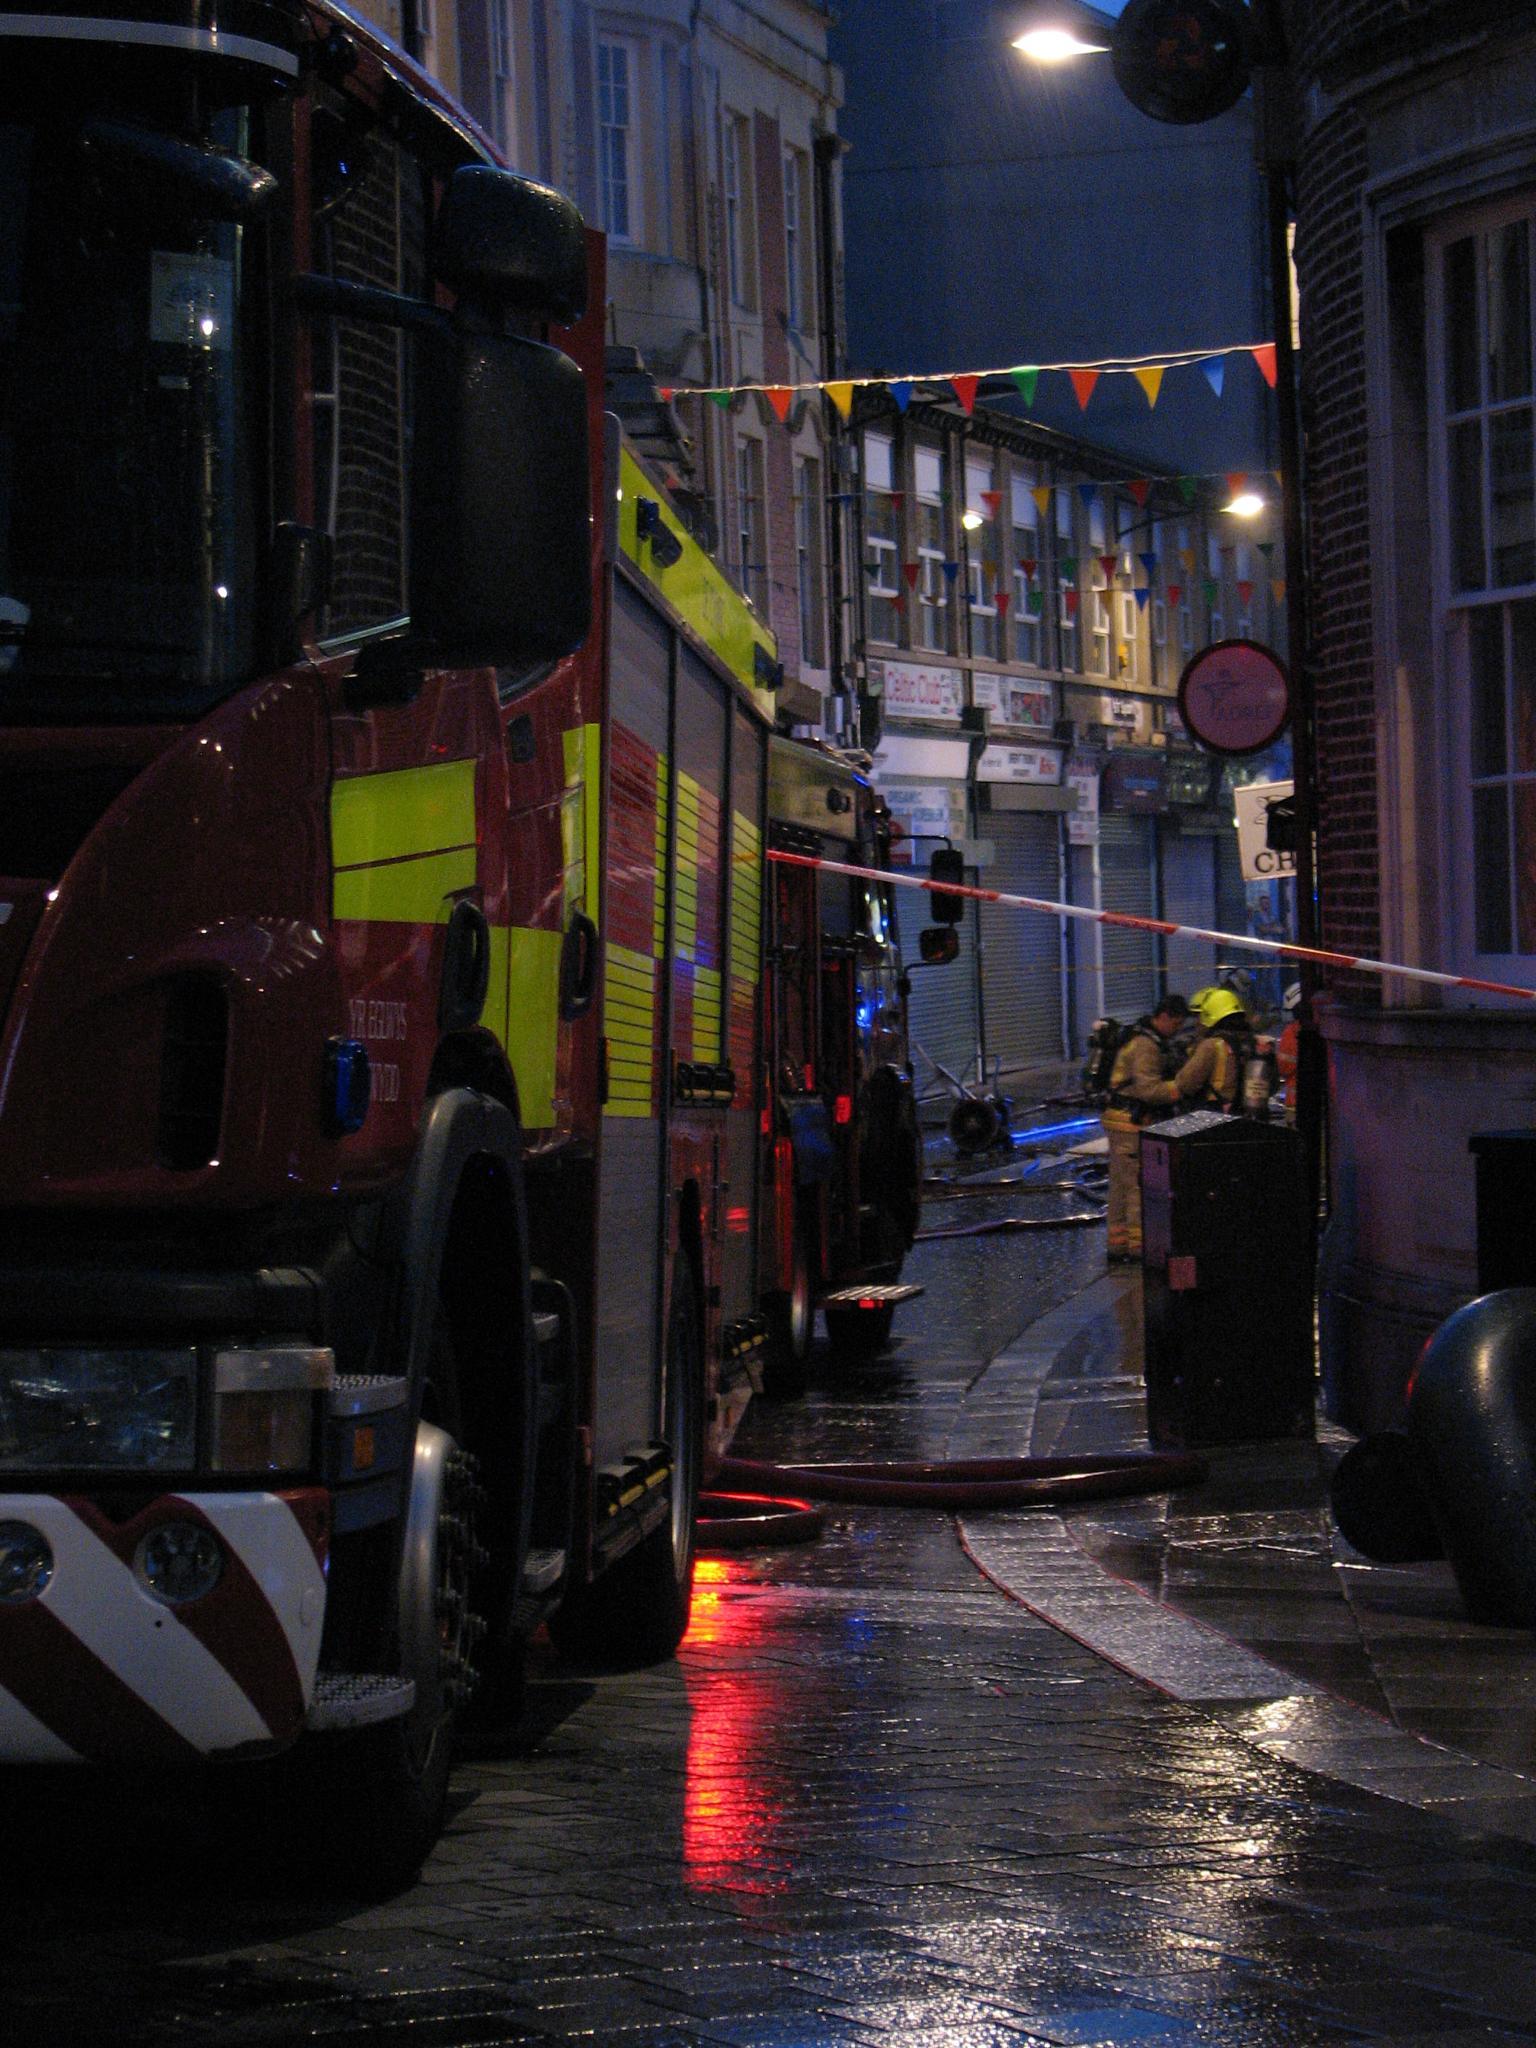 fireman at work by nigel.seldon.1